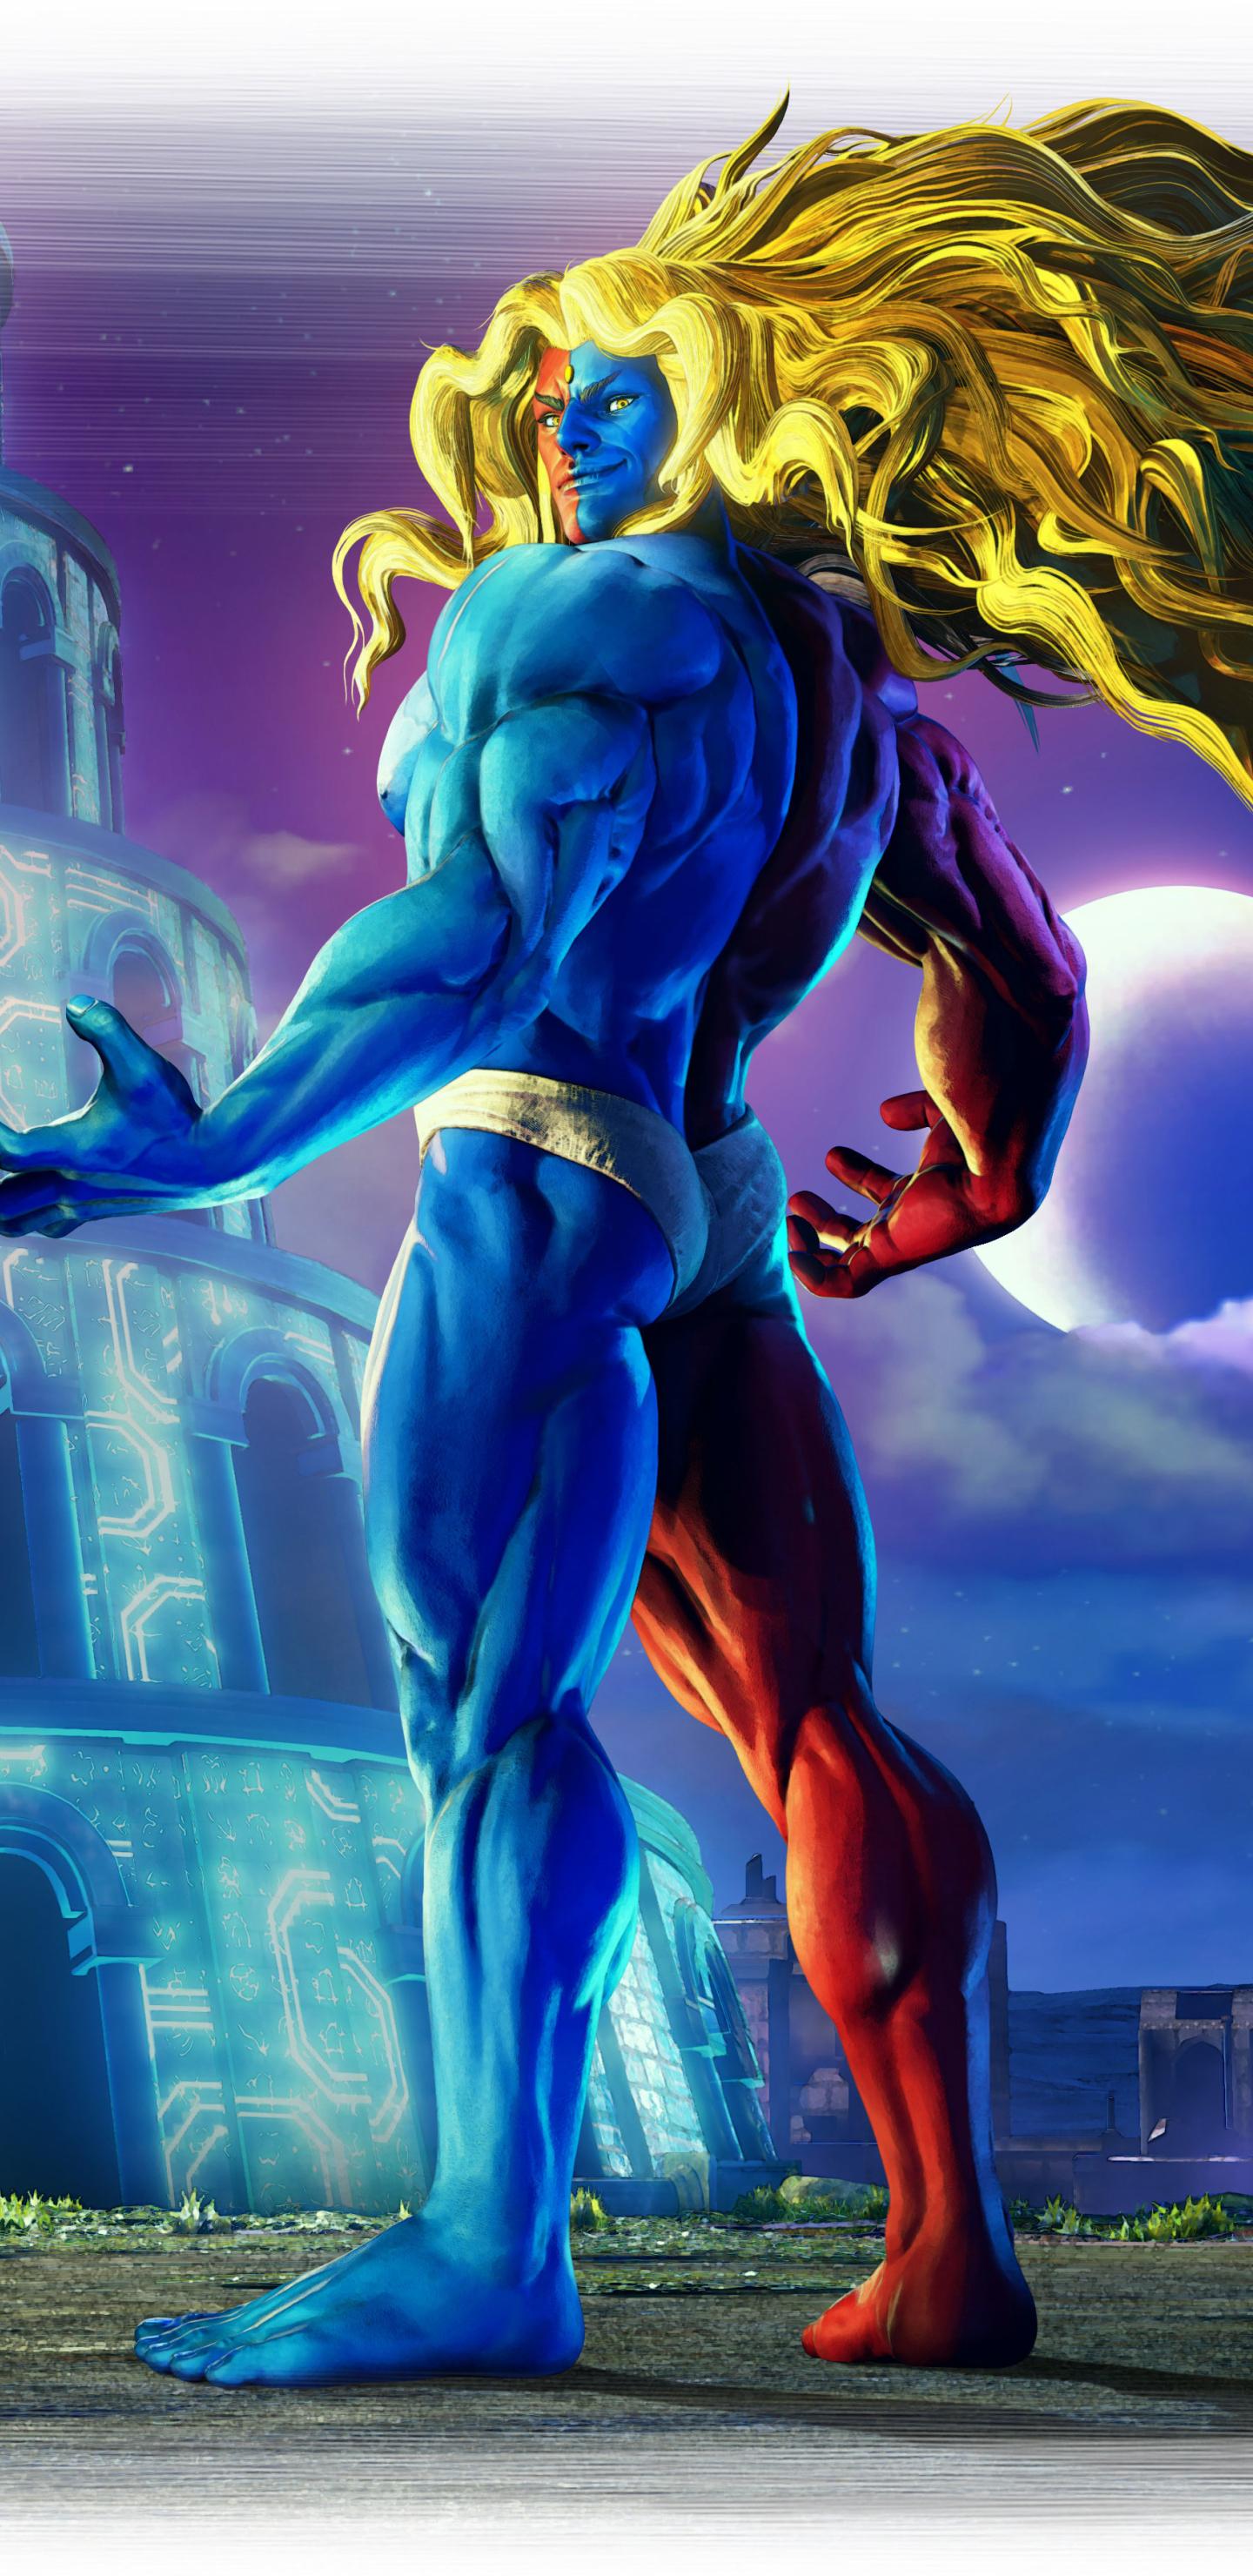 1440x2960 Gill In Street Fighter 5 Samsung Galaxy Note 9,8 ...